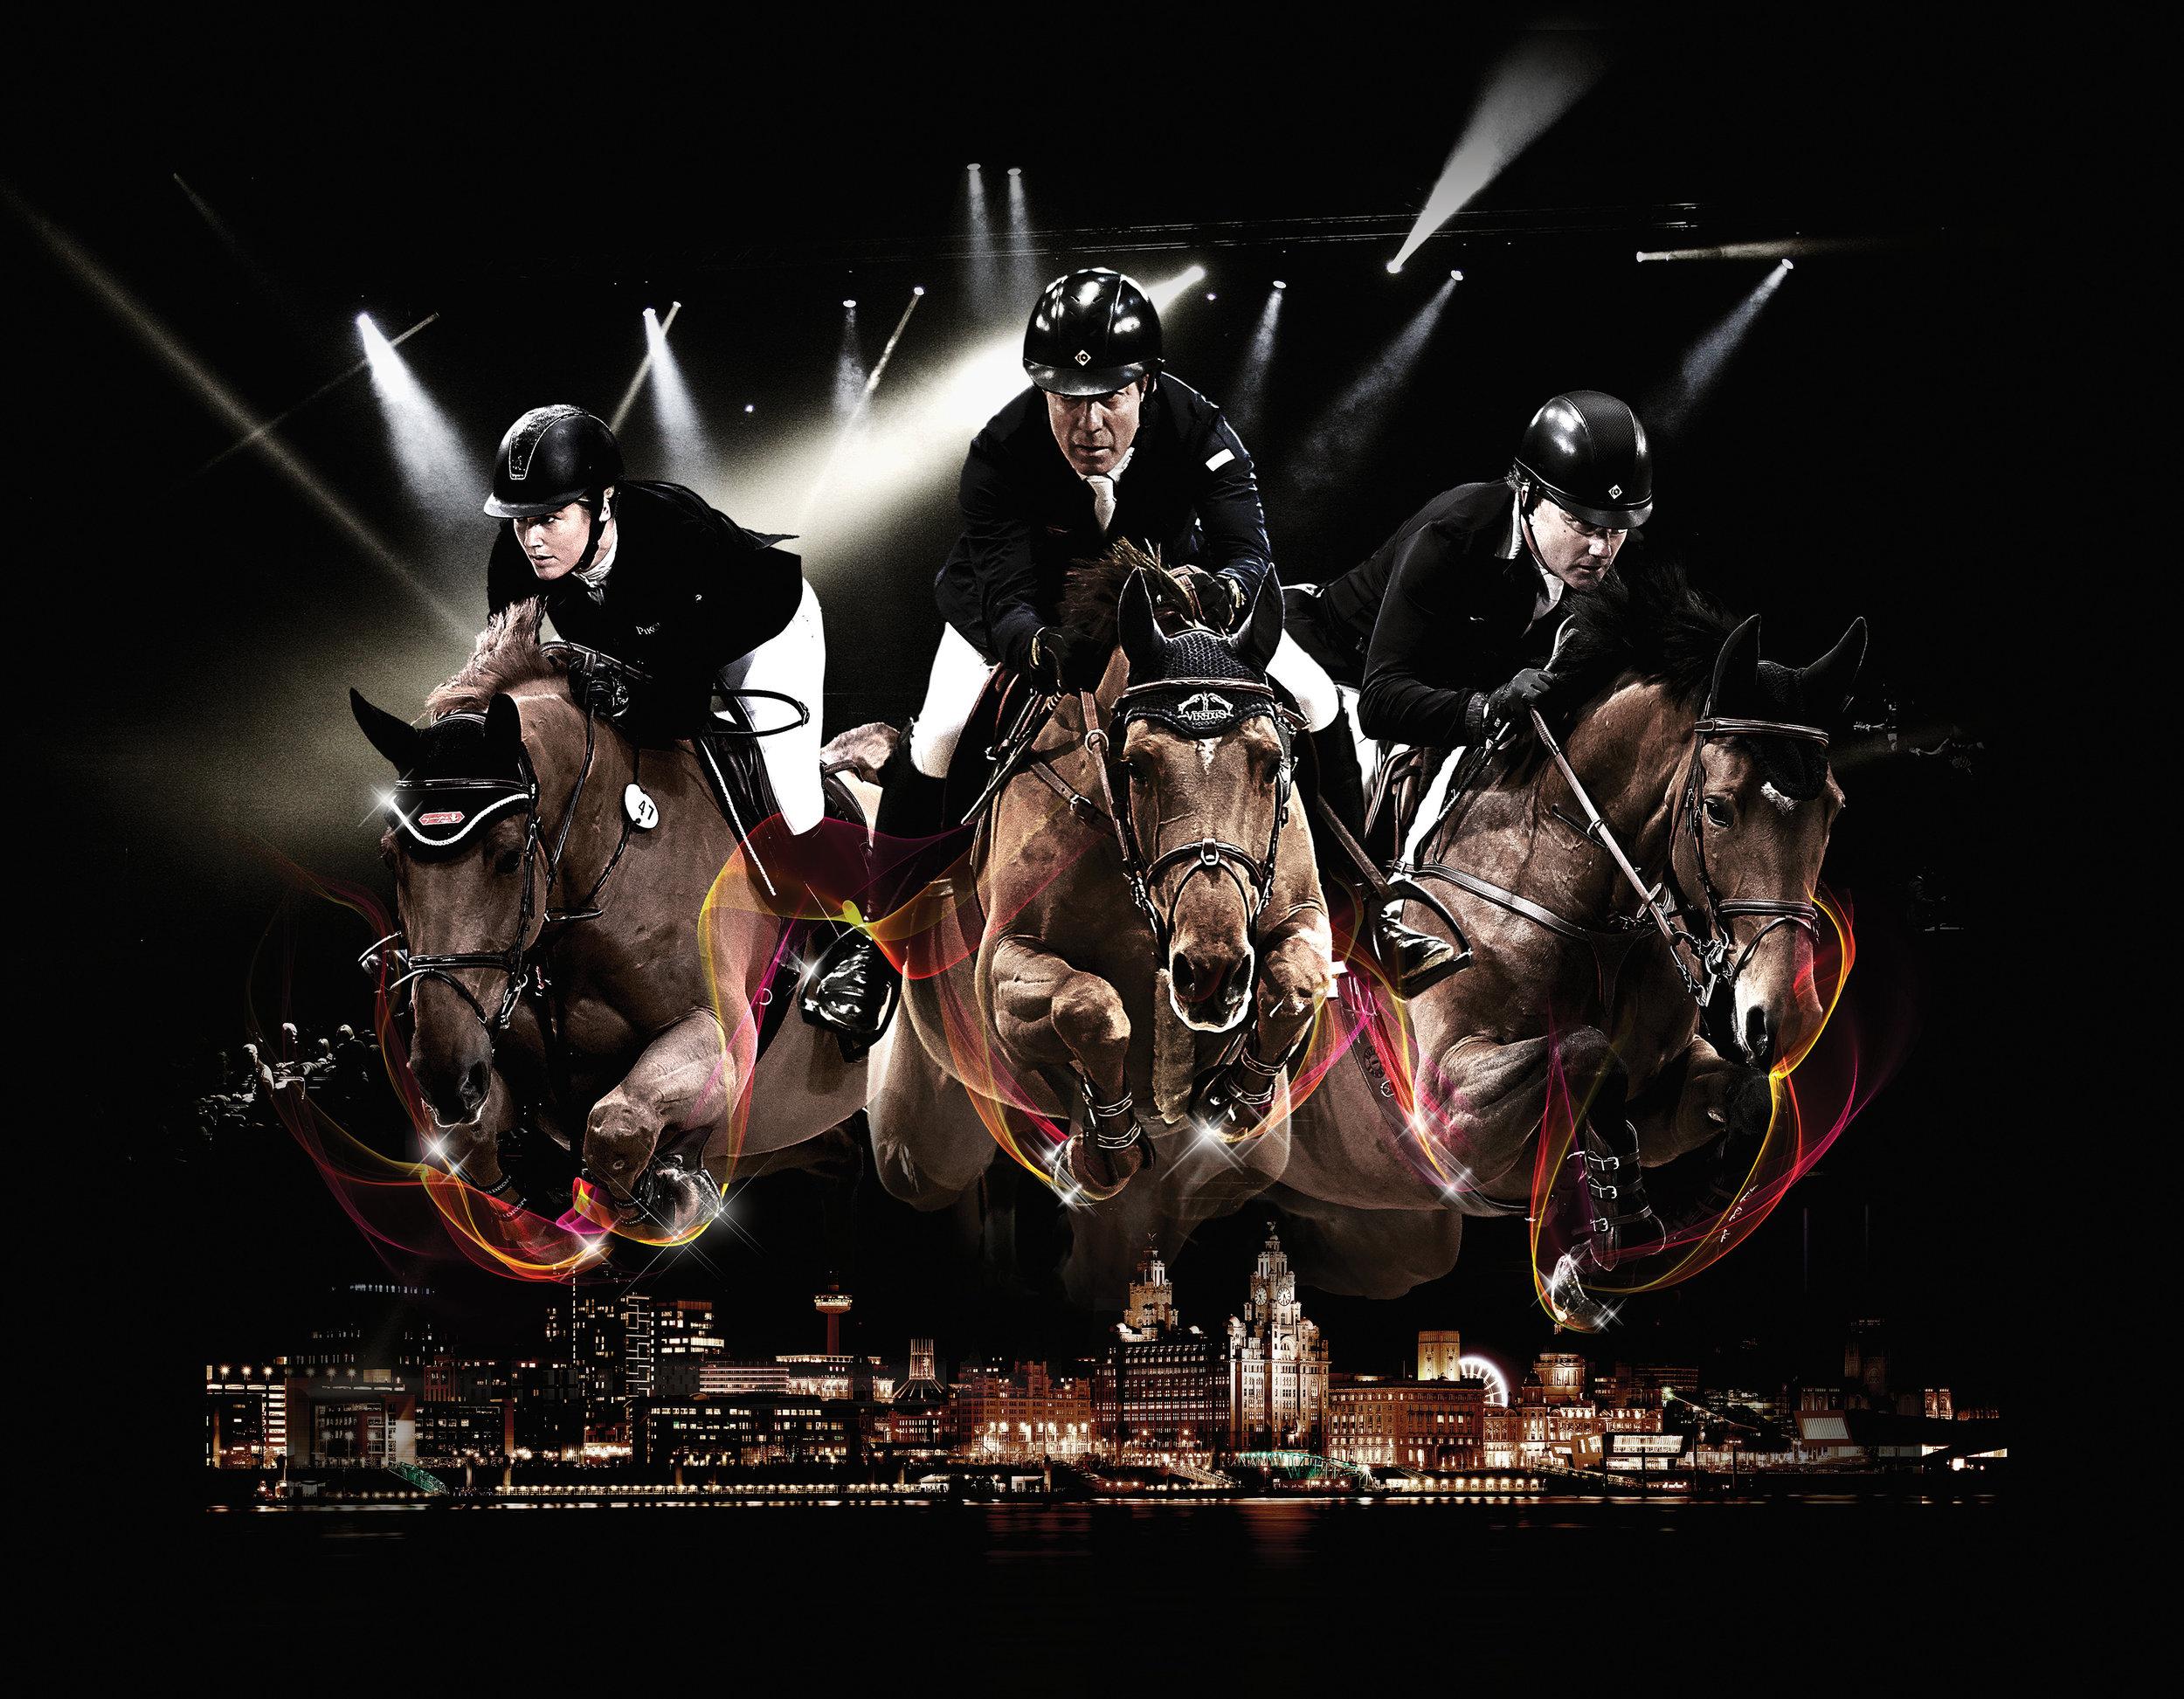 Liverpool Horse Show